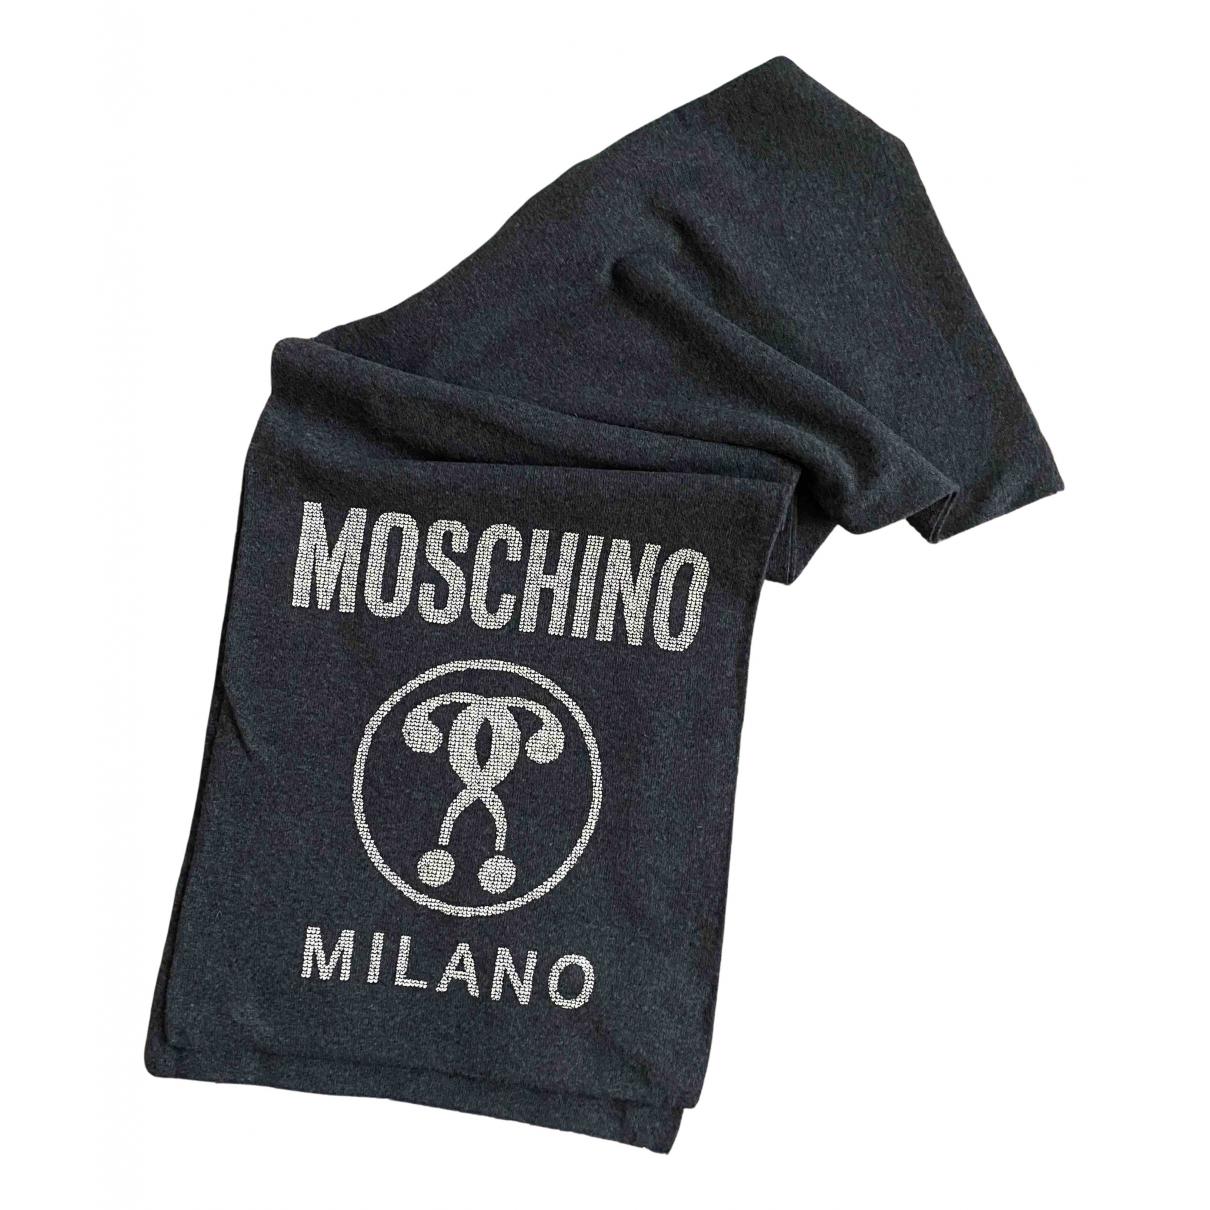 Moschino N Grey Wool scarf & pocket squares for Men N